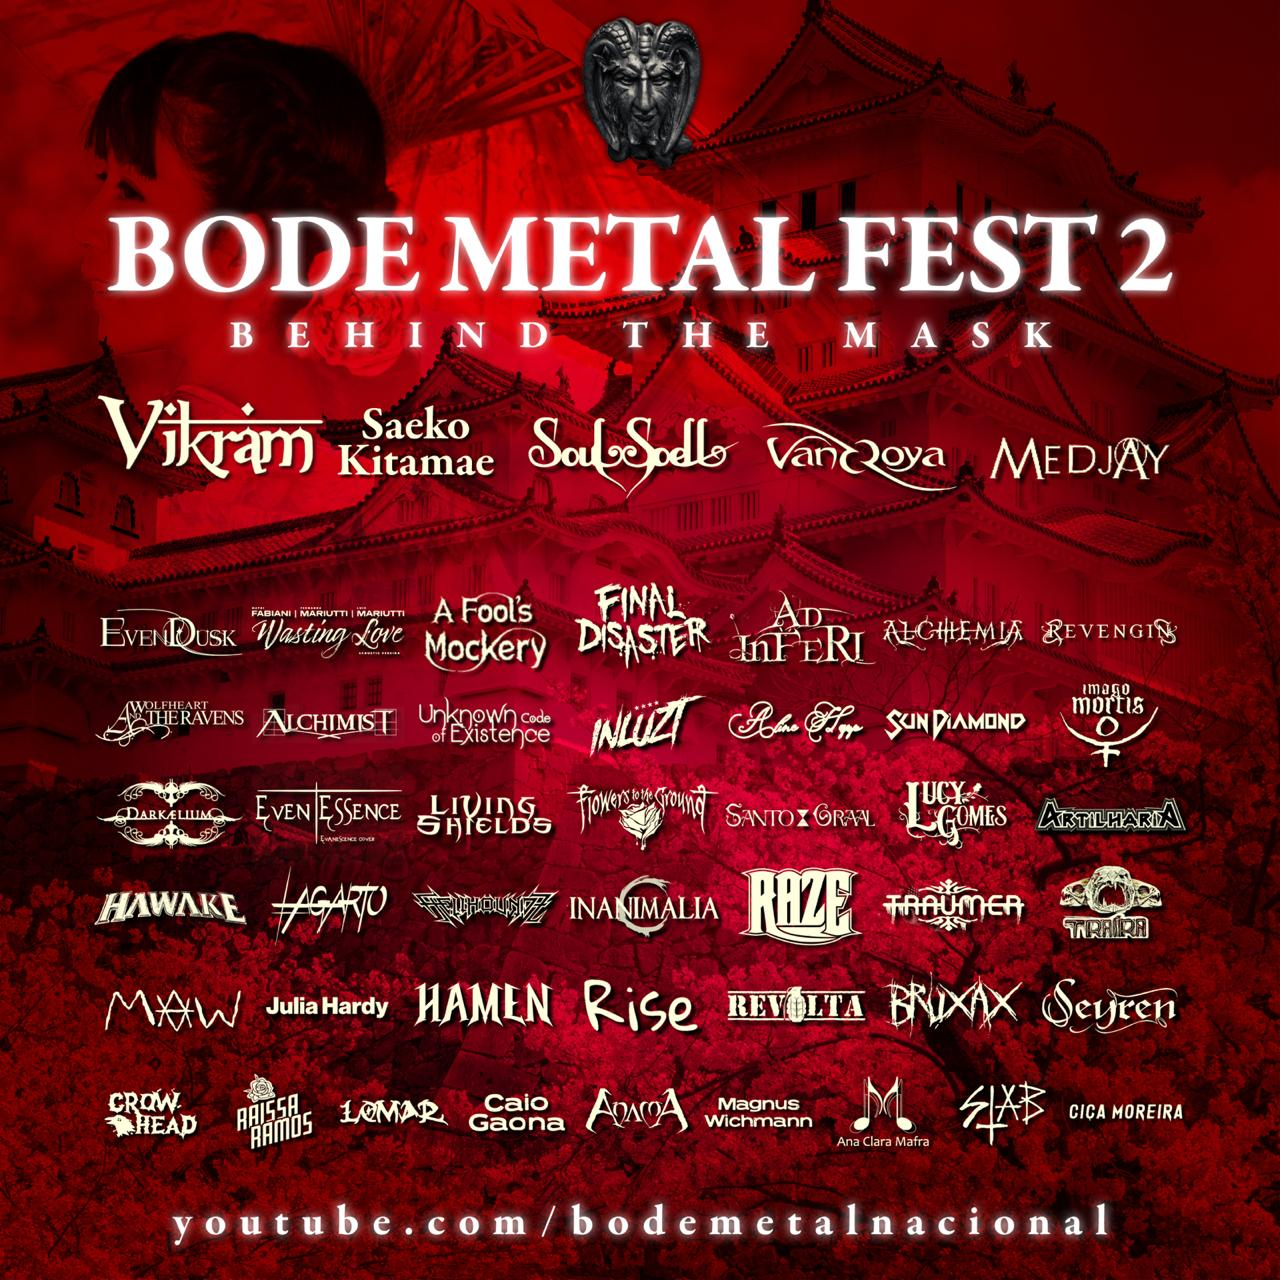 Bode Metal Fest II – Behind The Mask